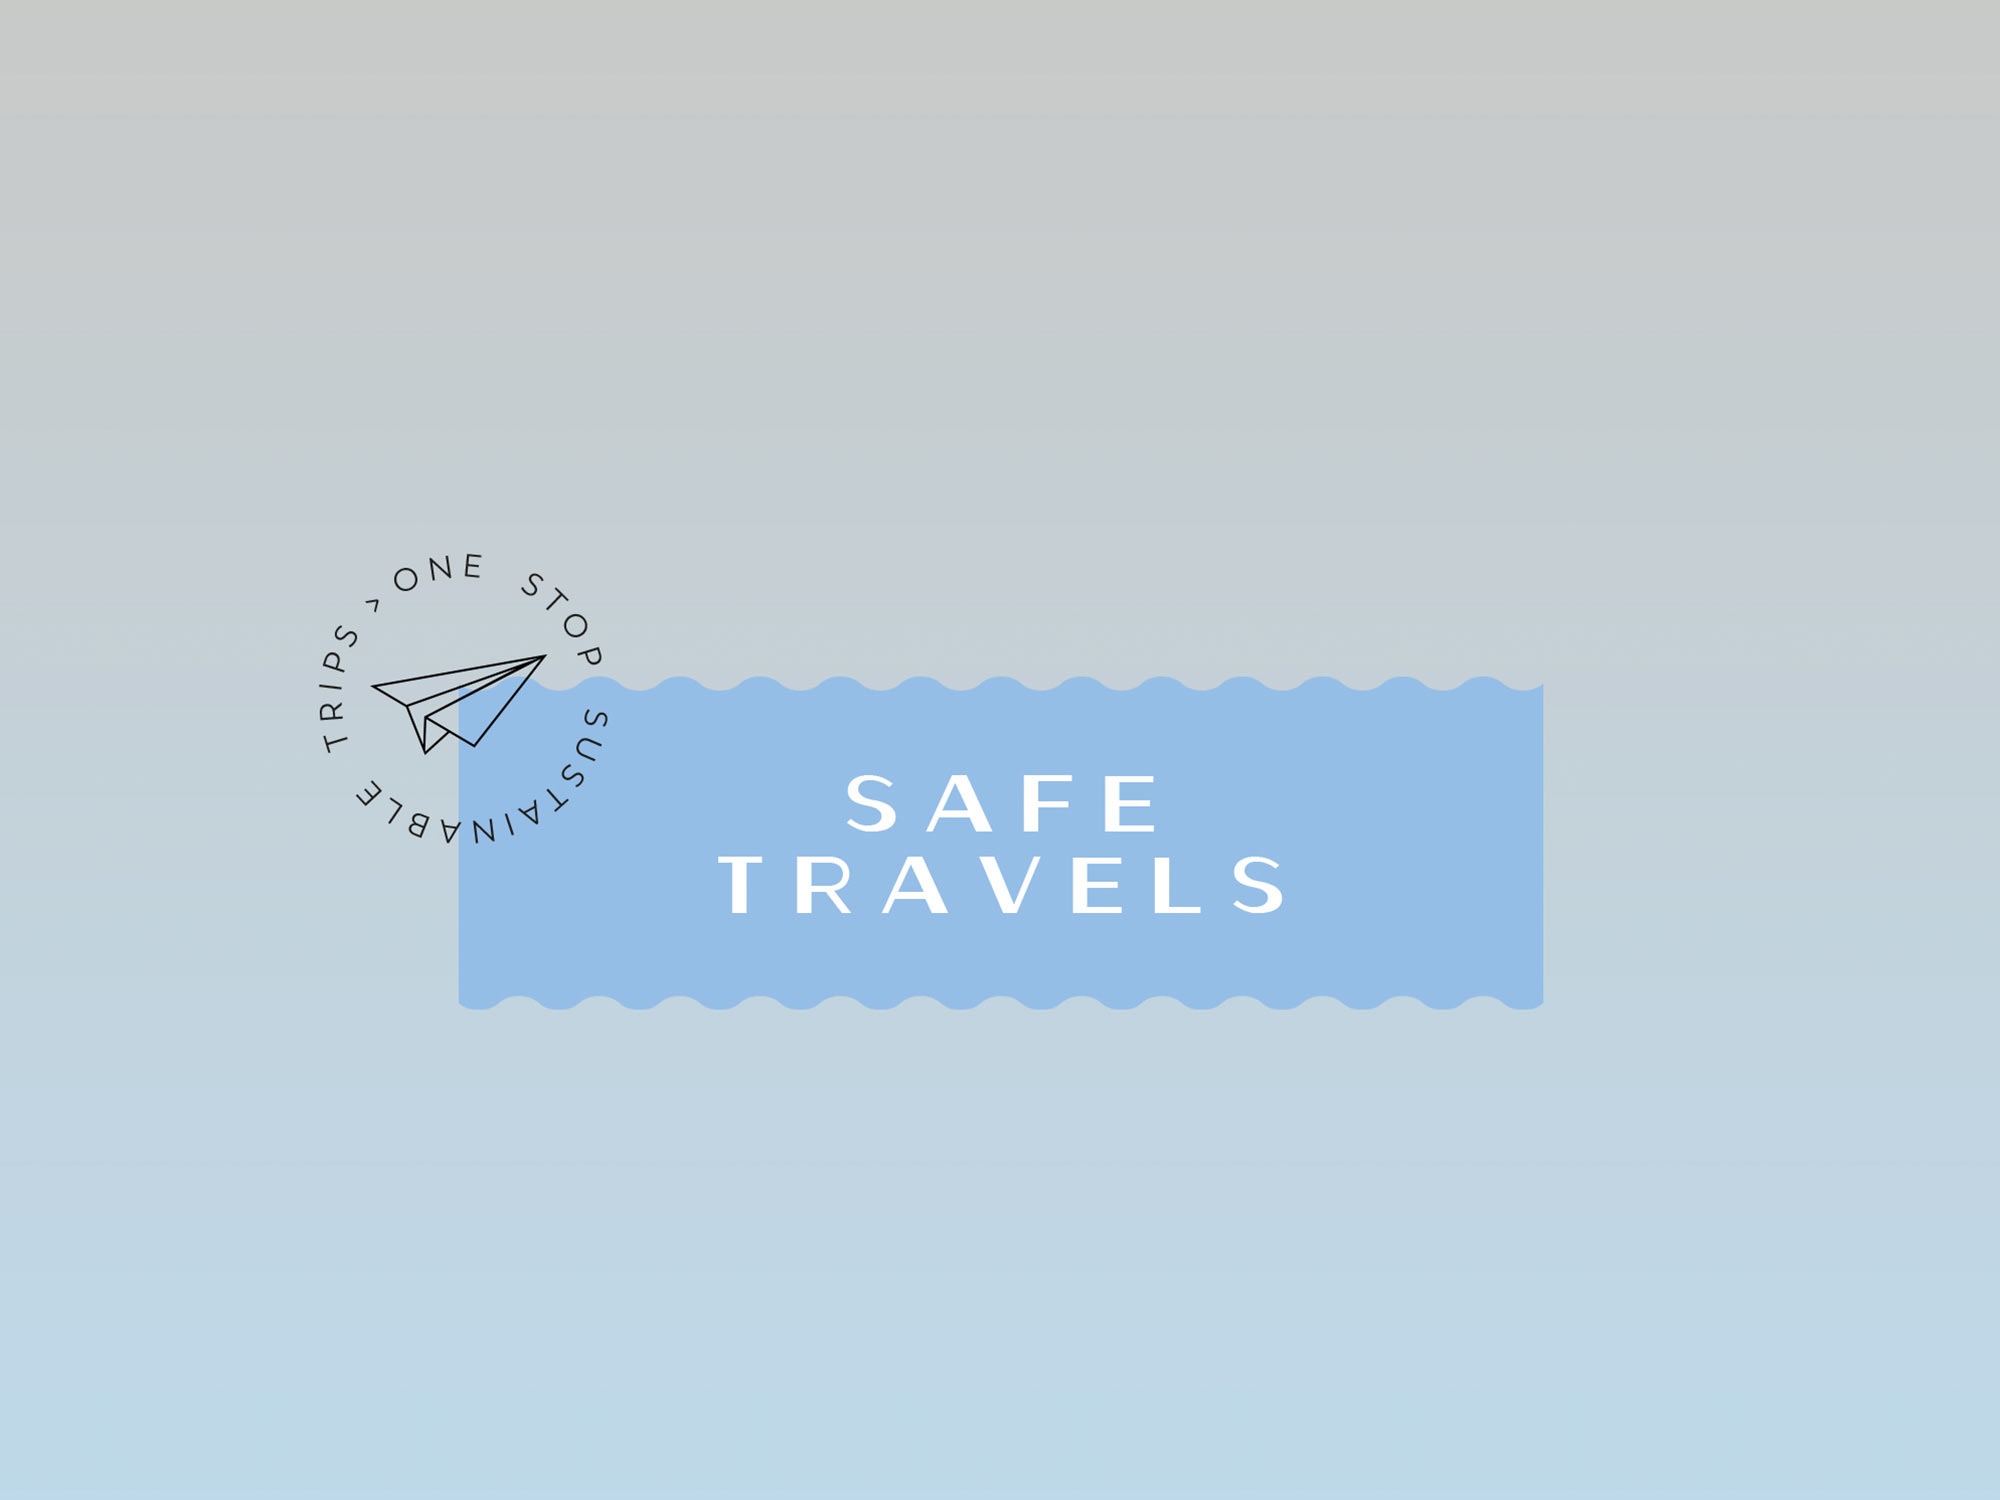 TheWildlyDesign-logo-safe-travels.jpg